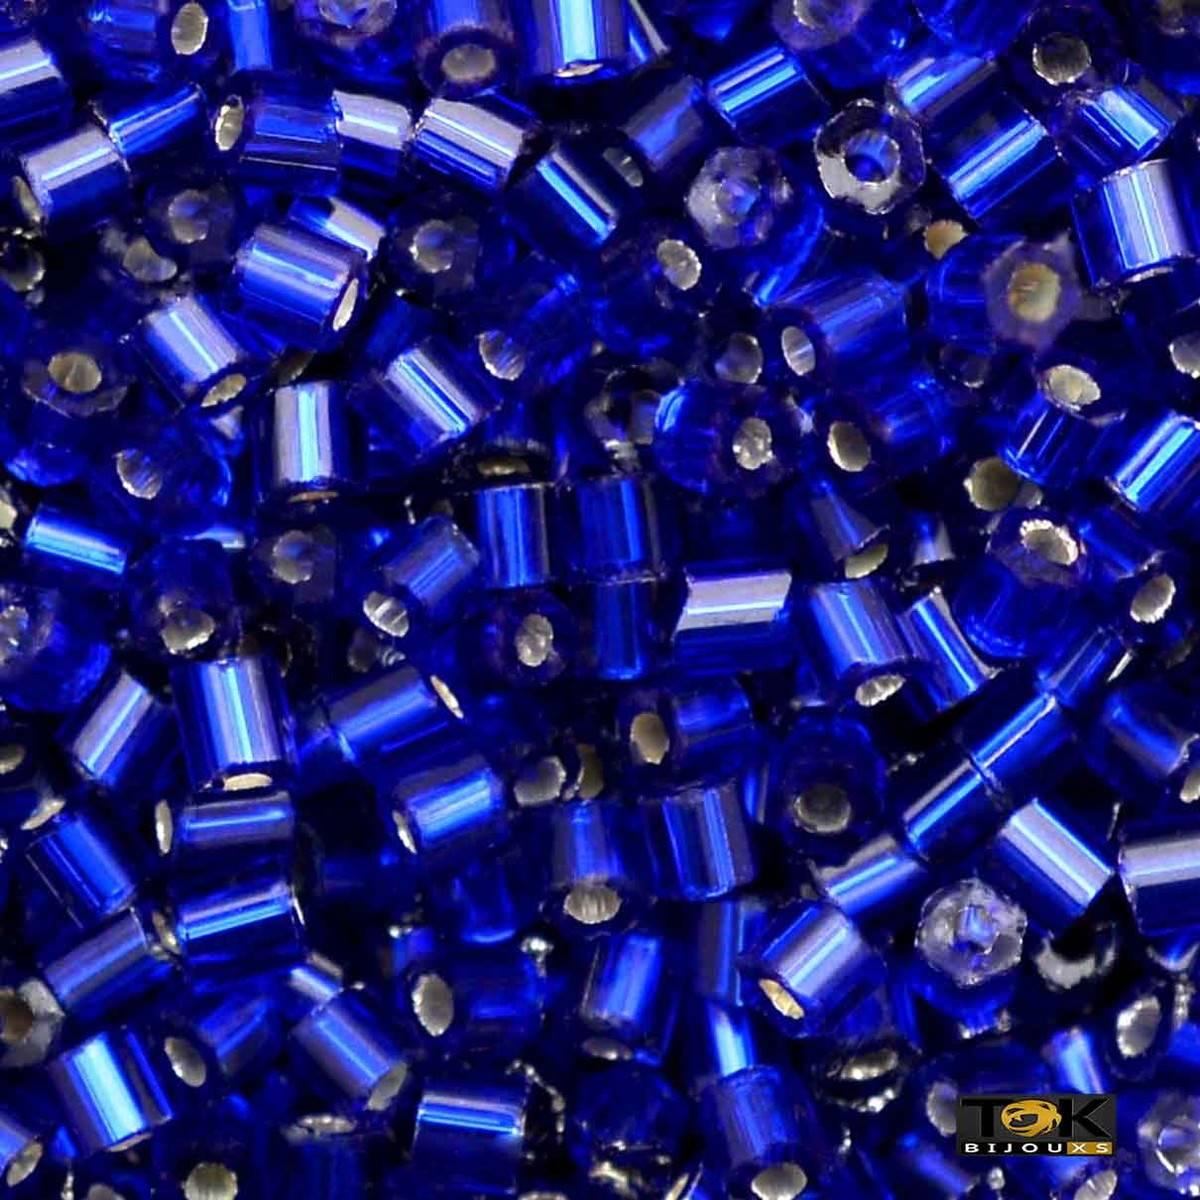 Vidrilho Jablonex - Azul Royal Escuro Transparente Ref.37100 - 25g